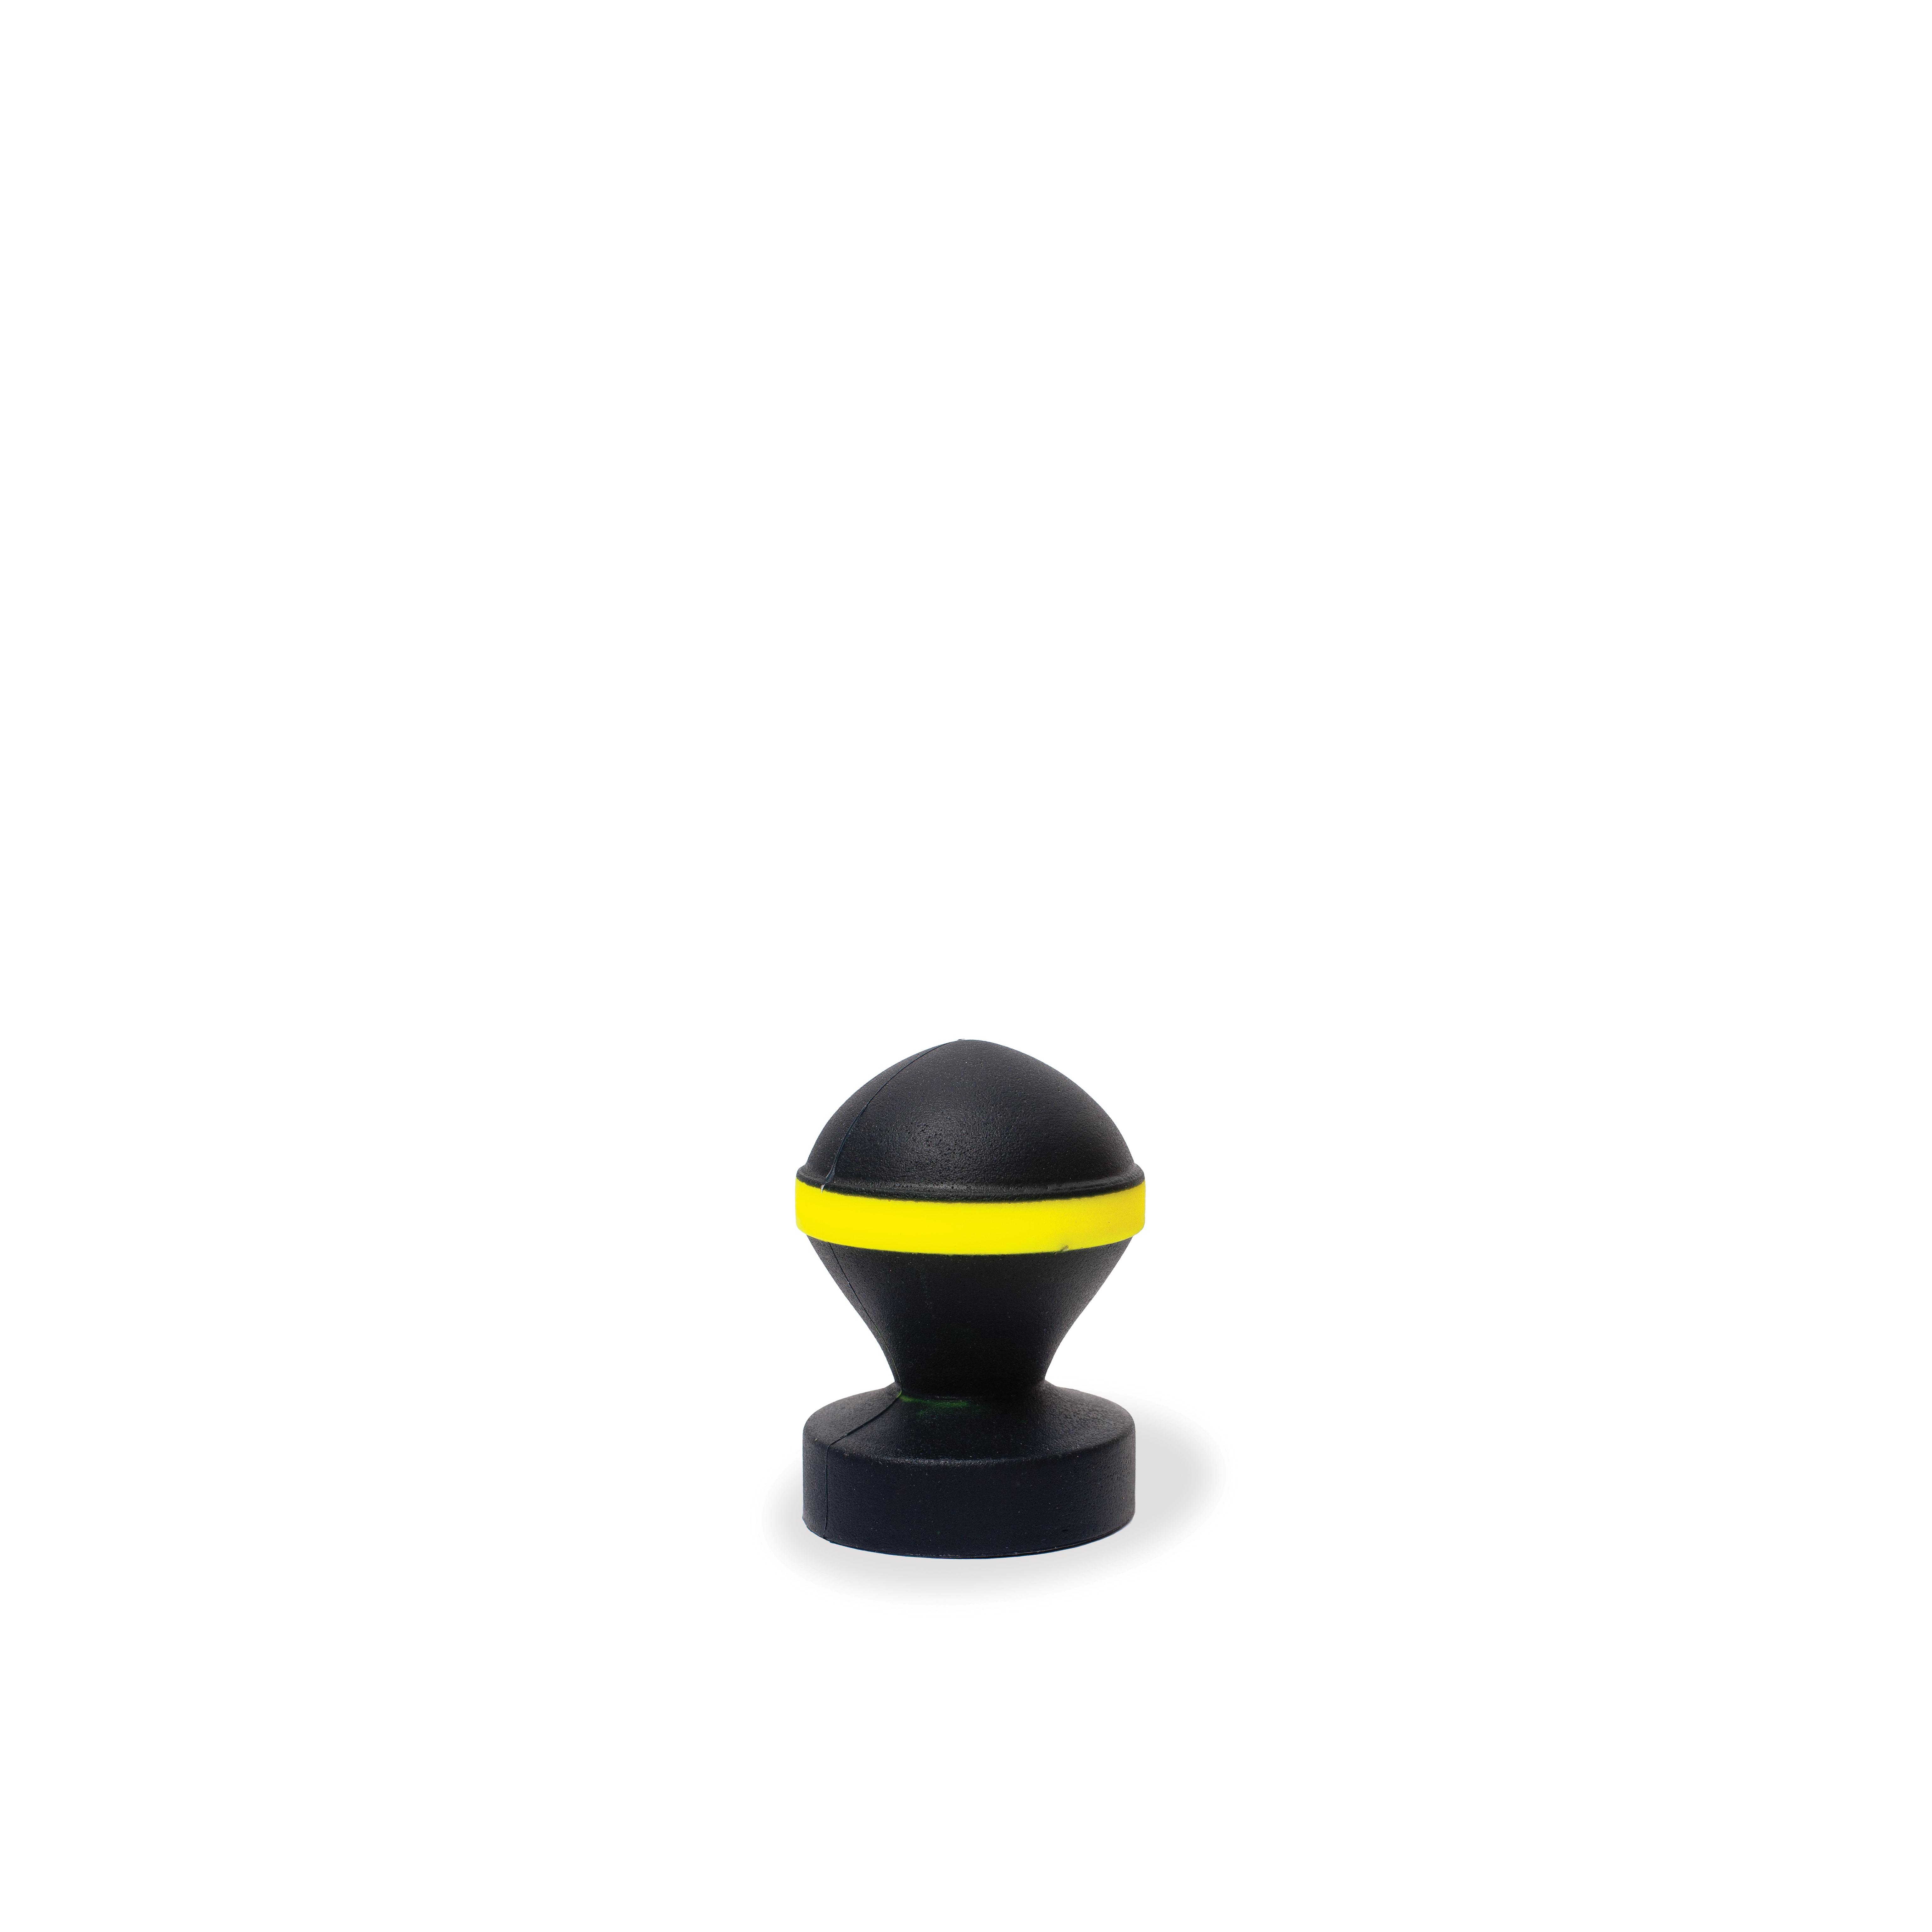 Silikon Anal Plug Fluo Valve 10,5 x 7 cm schwarz/gelb